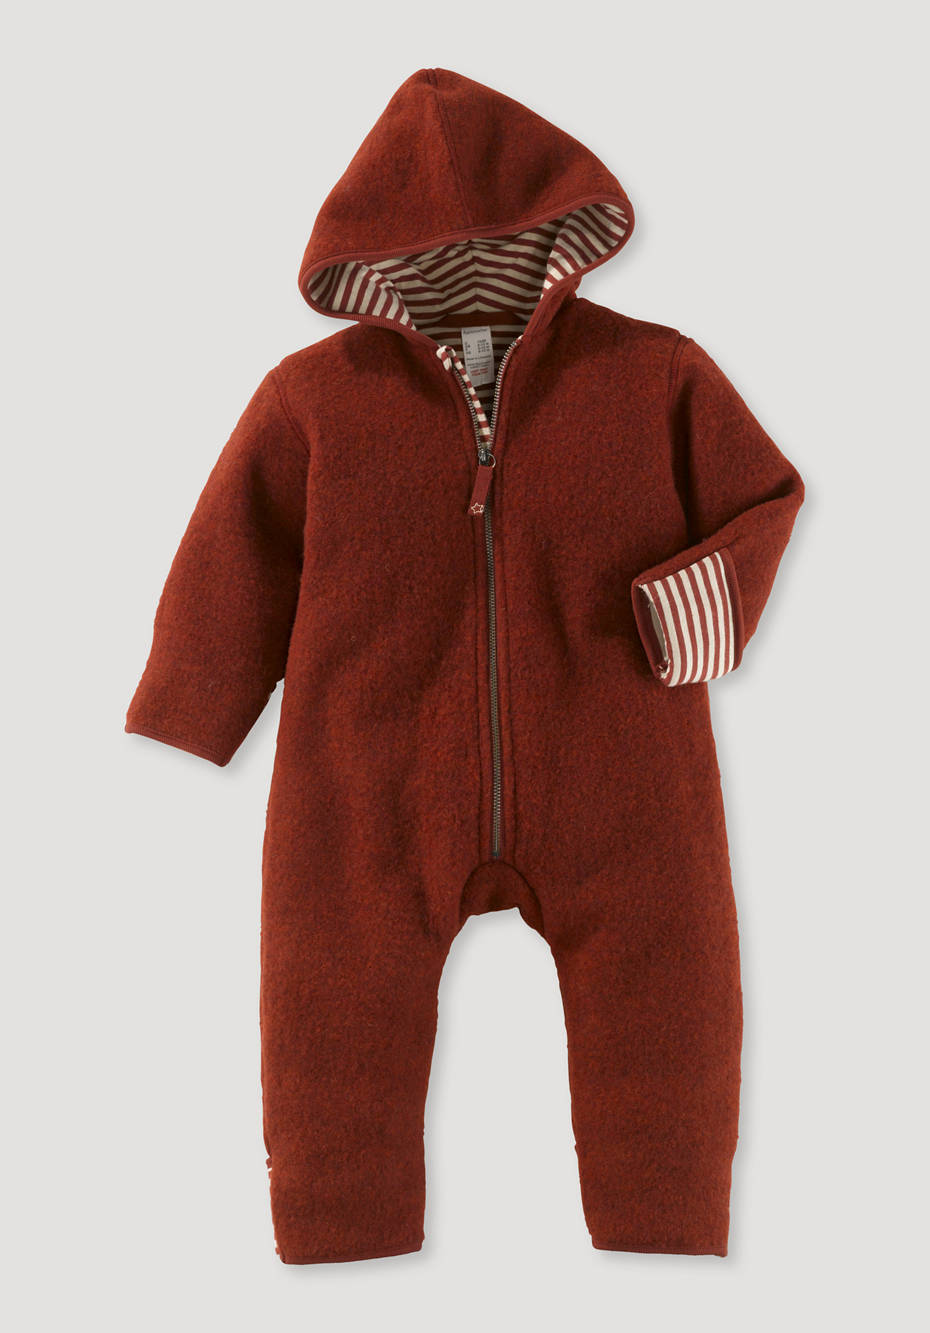 Wool fleece overall made from organic merino wool